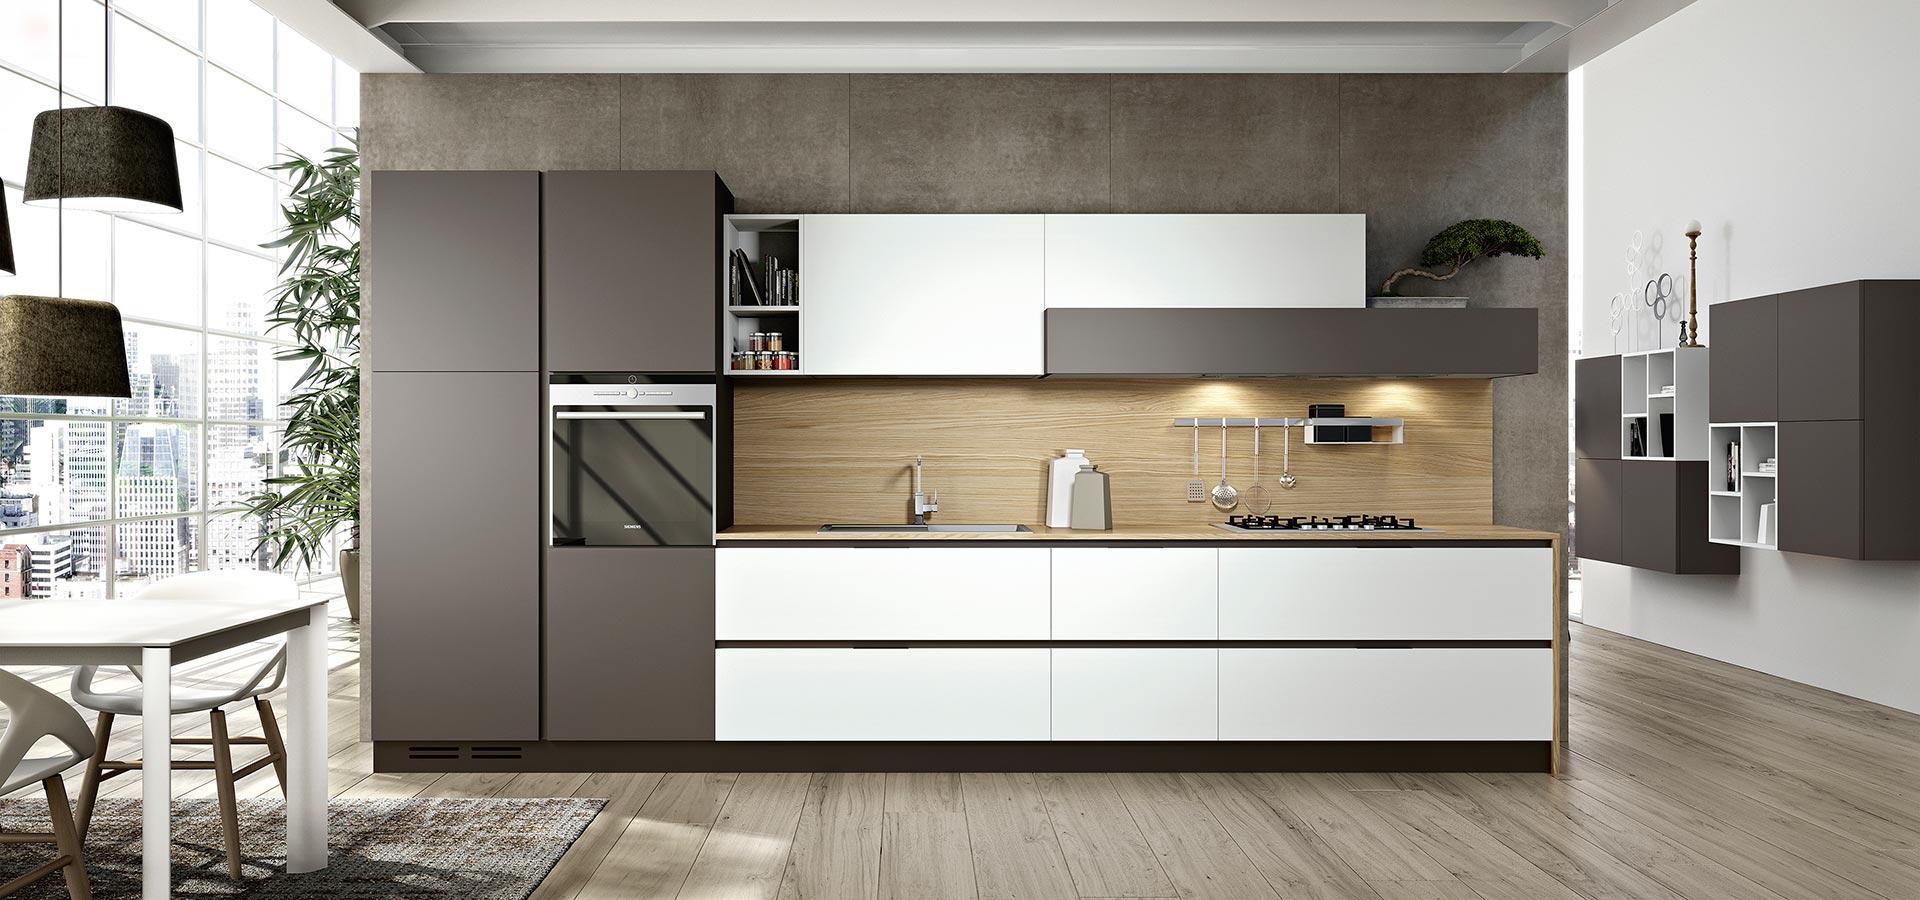 Arredamenti Gallomobili Mobili Udine - Cucine Moderne ...